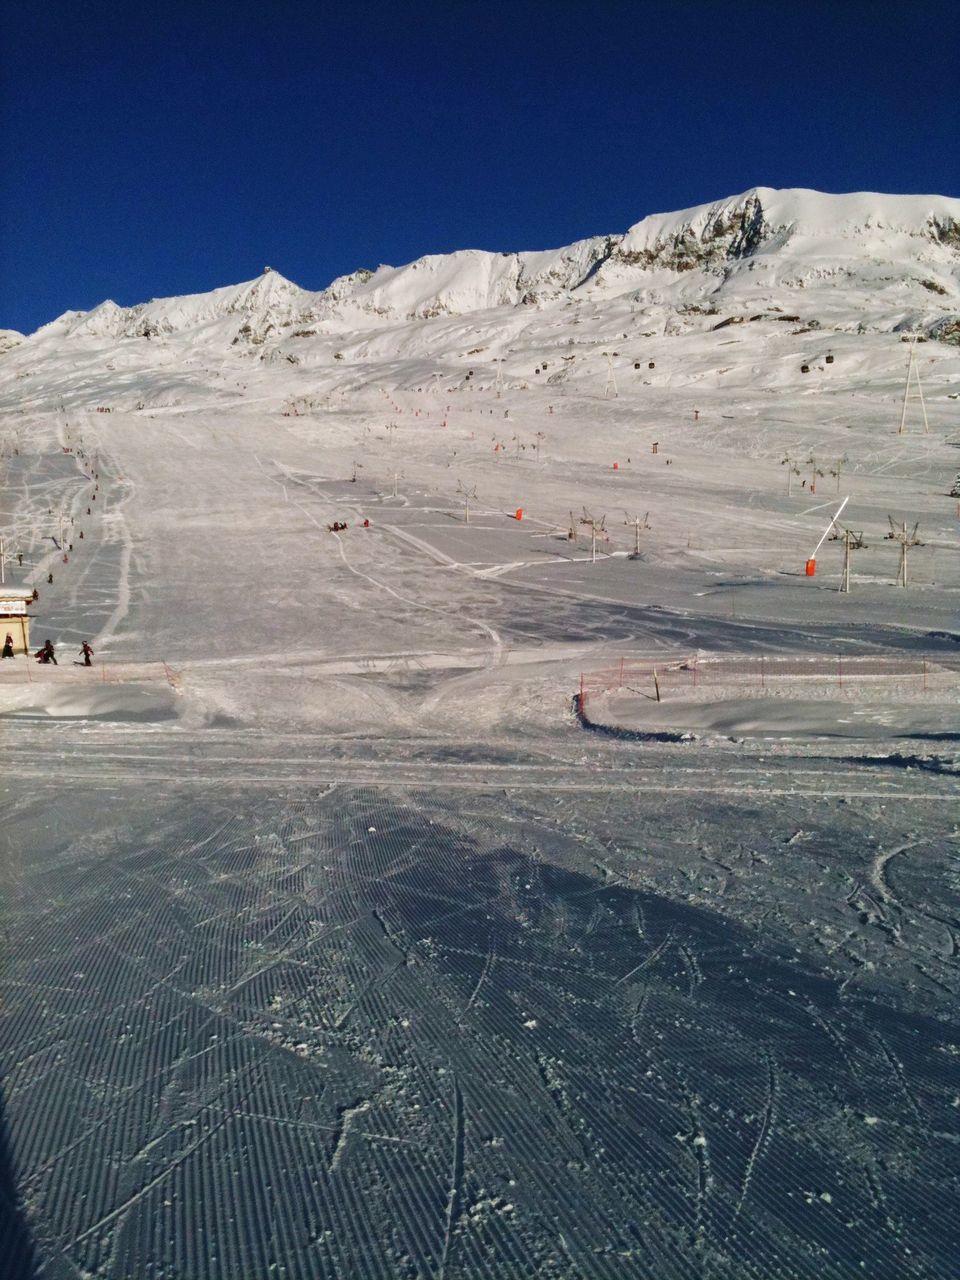 High Angle View Of Ski Lifts And Ski Track At Tourist Resort